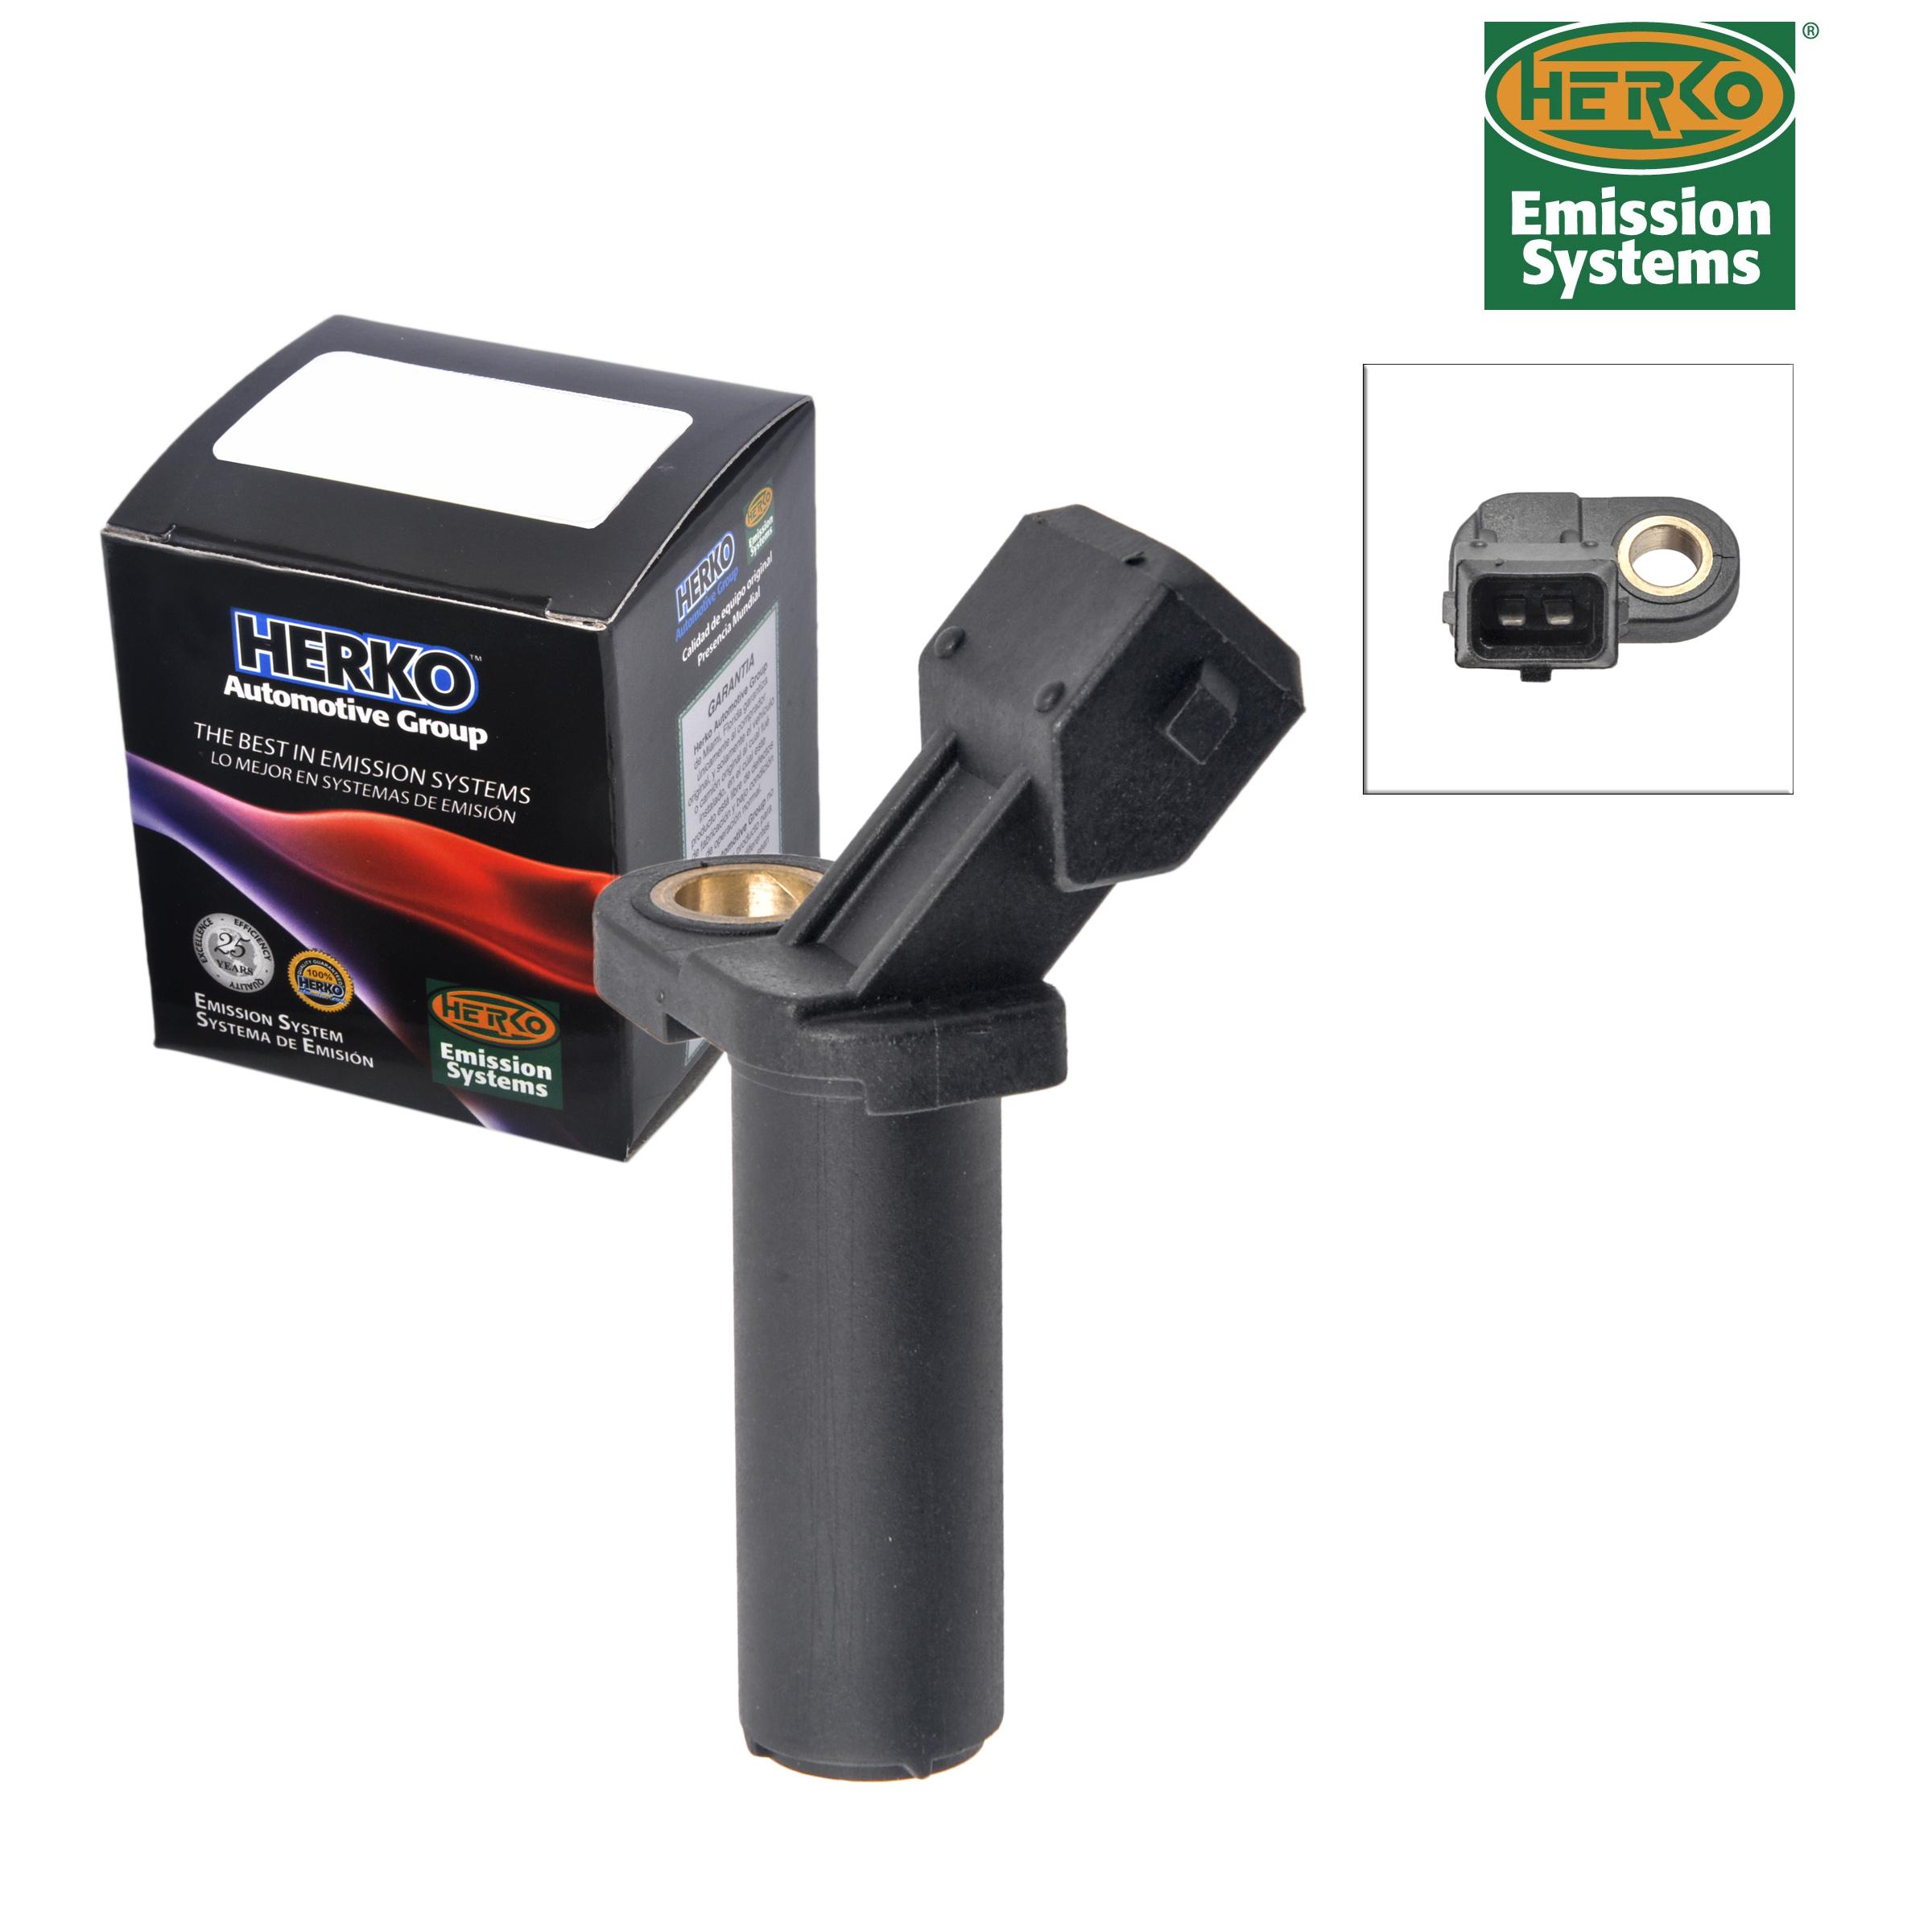 Herko Crankshaft Position Sensor CKP2010 For Ford Mercury Mazda 95-07